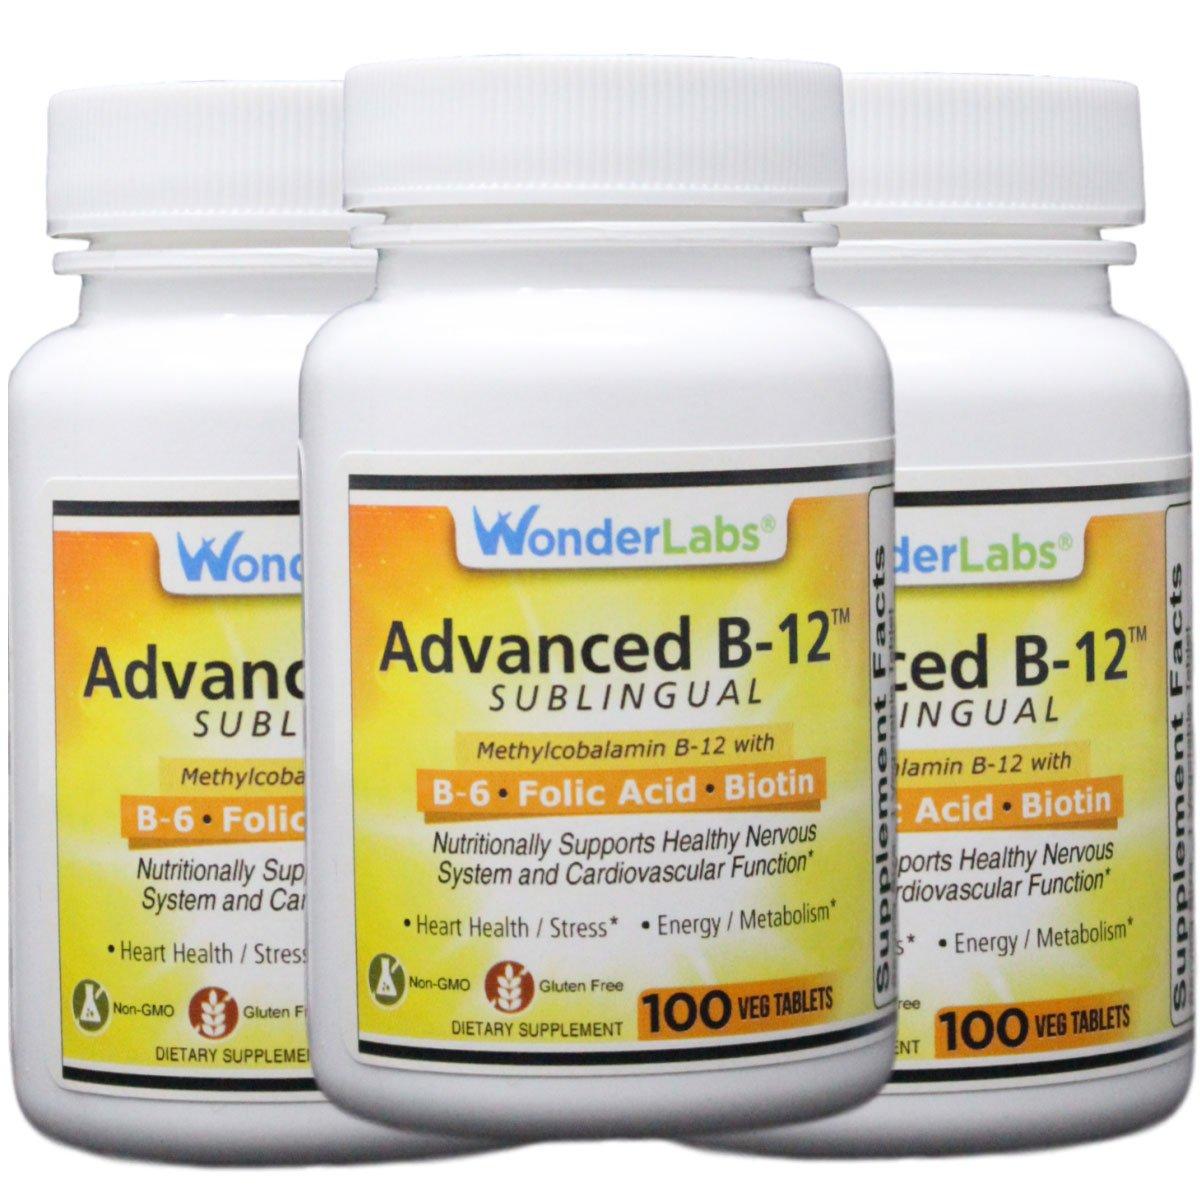 Sublingual Vitamin B12 1000 mcg , B6 5mg , Folic Acid 400 mcg Biotin 25mcg – Formulated with Methylcobalamin Vitamin B-12 3 Bottles of 100 Tablets – 300 Total Tablets